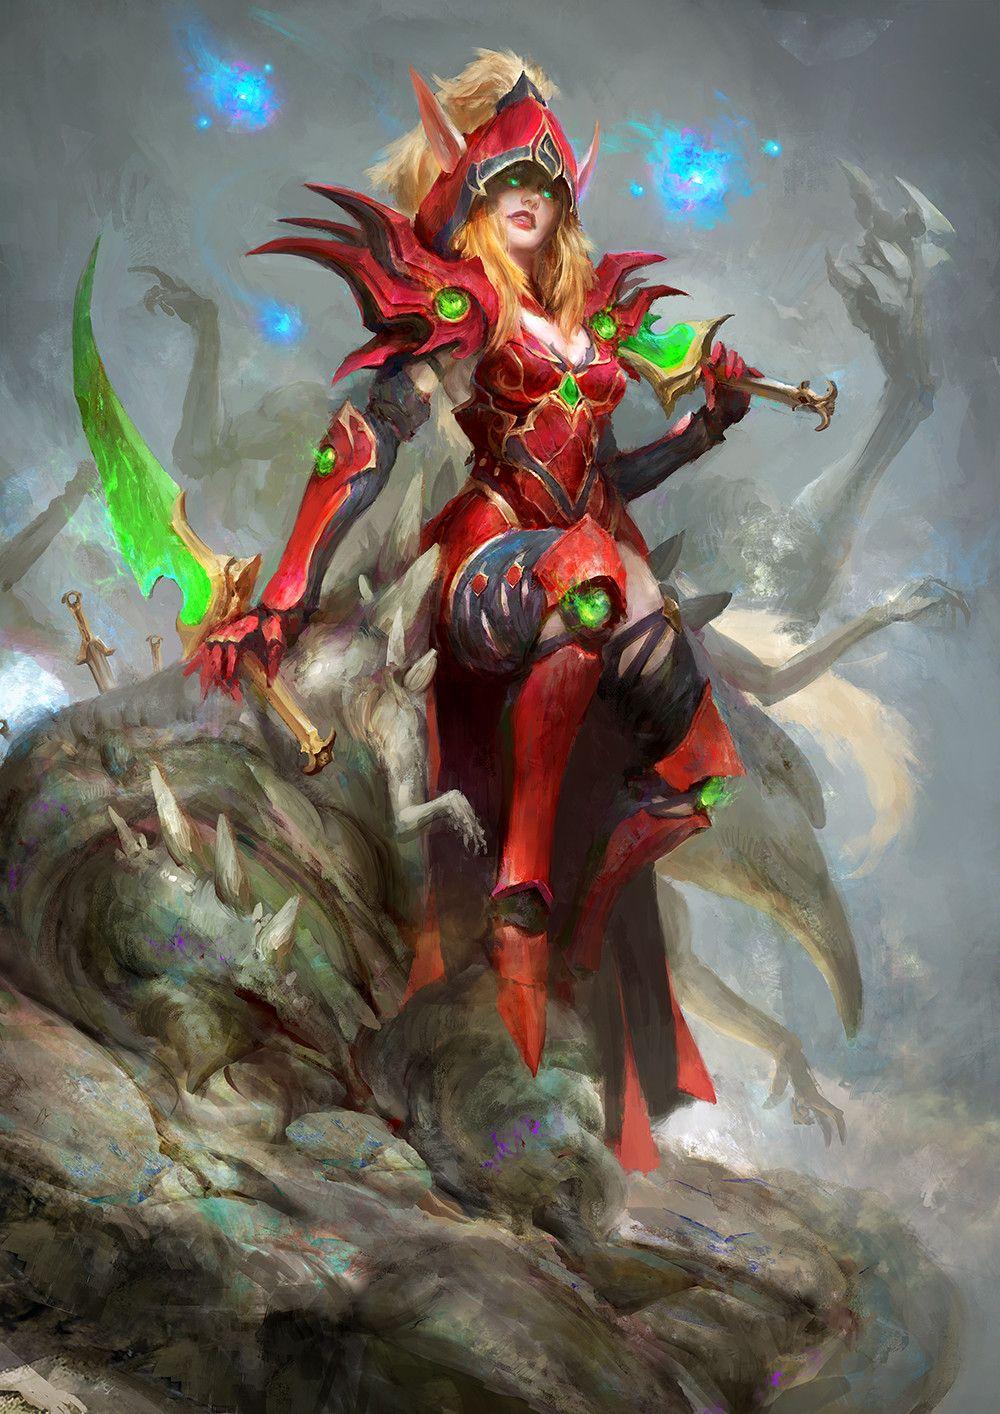 Valeera Daniel Kamarudin On Artstation At Https Www Artstation Com Artwork Onepk Warcraft Art Warcraft World Of Warcraft Game Heroes of the storm valeera guide 2017 #hots #valeera marcelian hots logs: valeera daniel kamarudin on artstation